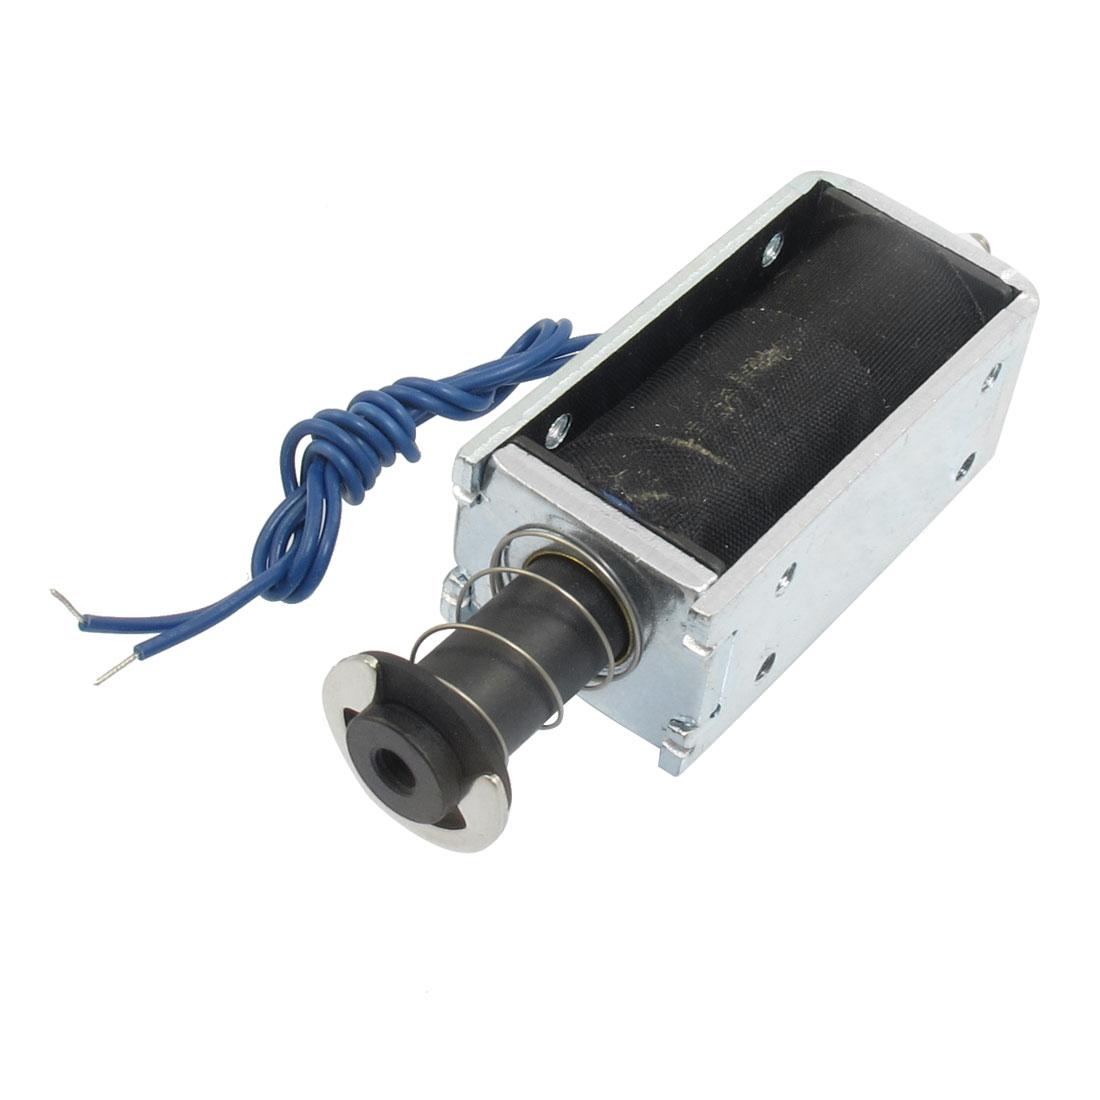 Spring DC 12V 1.5A 3000GF/0mm 500GF/5mm Push Type Solenoid Electromagnet